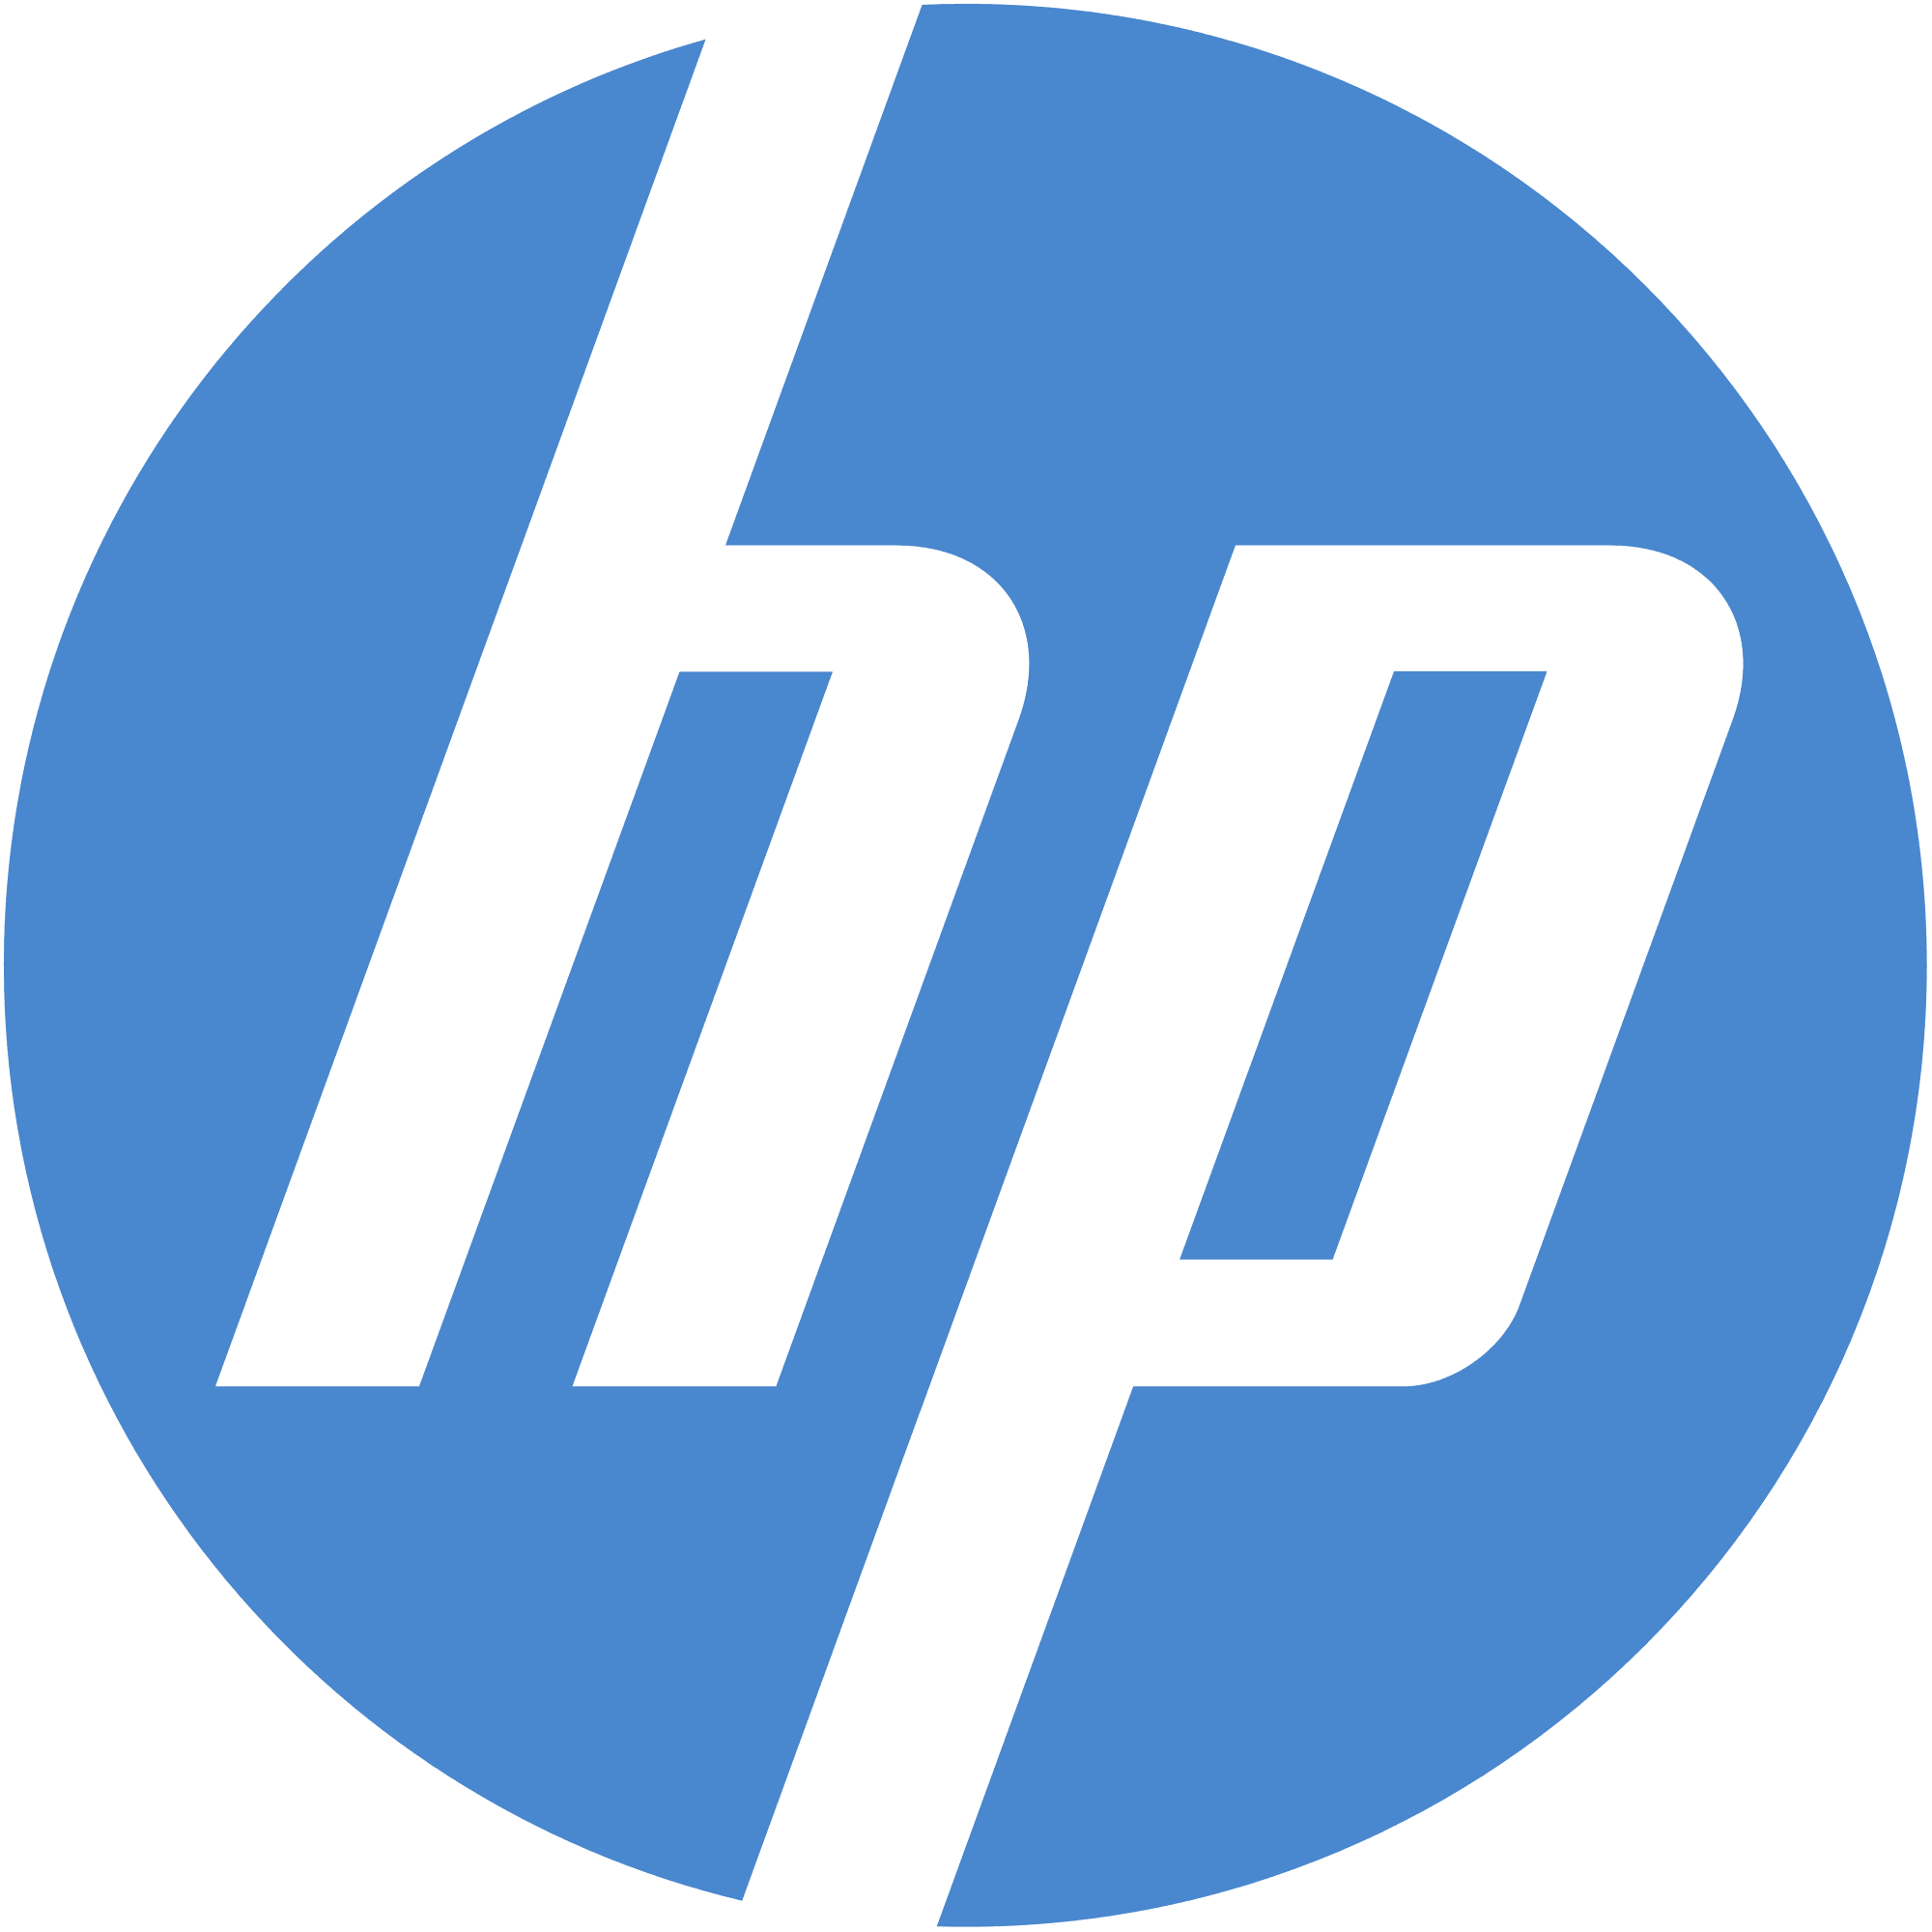 HP Scanjet G3110 Photo Scanner drivers